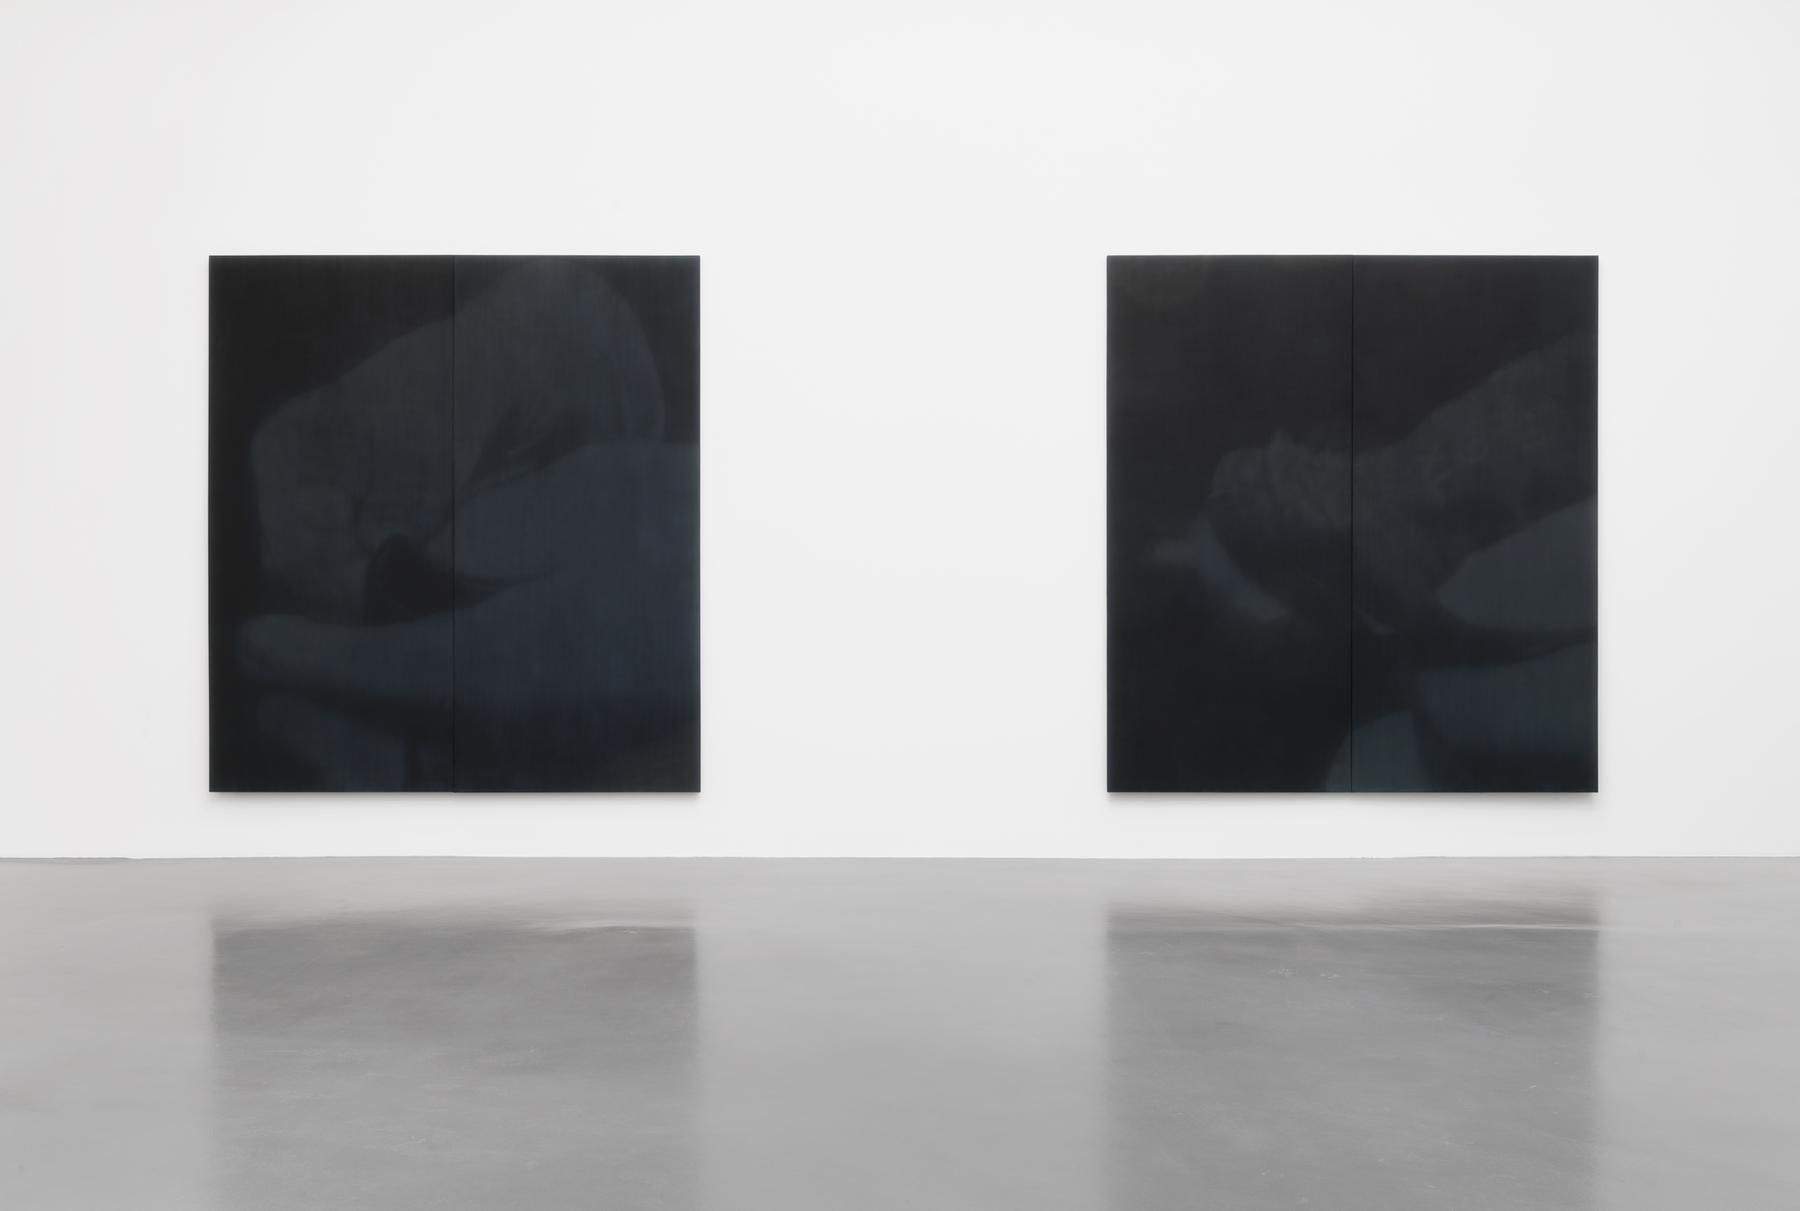 Troy Brauntuch Installation view 12